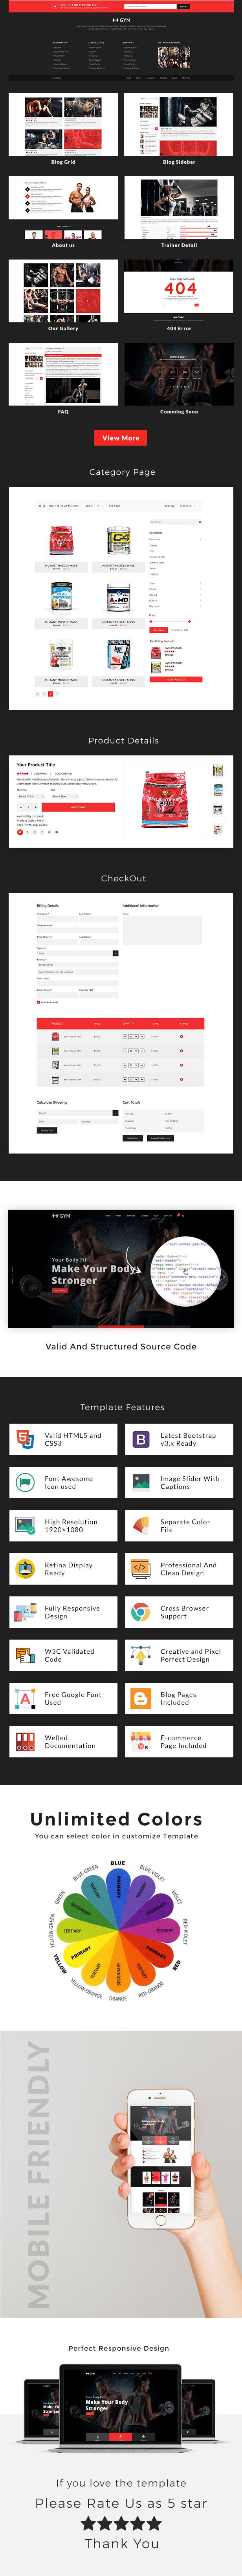 Vyayamshala - Gym & Fitness HTML5 Template - 2